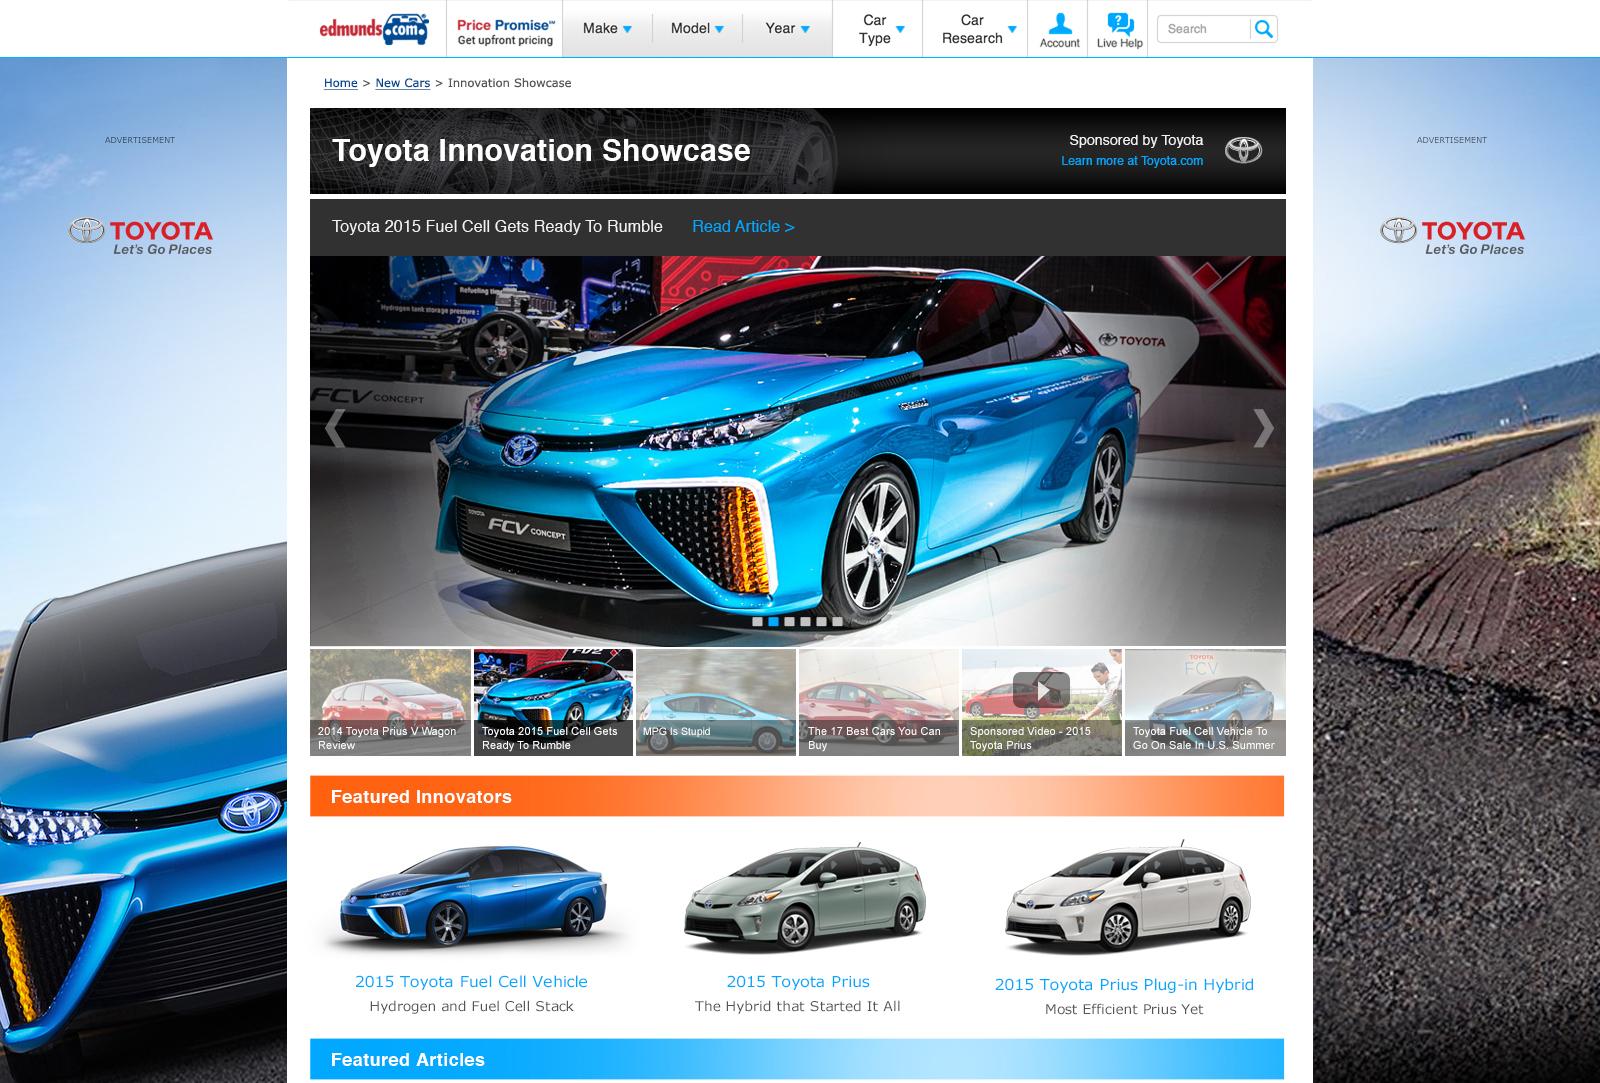 ToyotaInnovationShowroom_Crop1.jpg